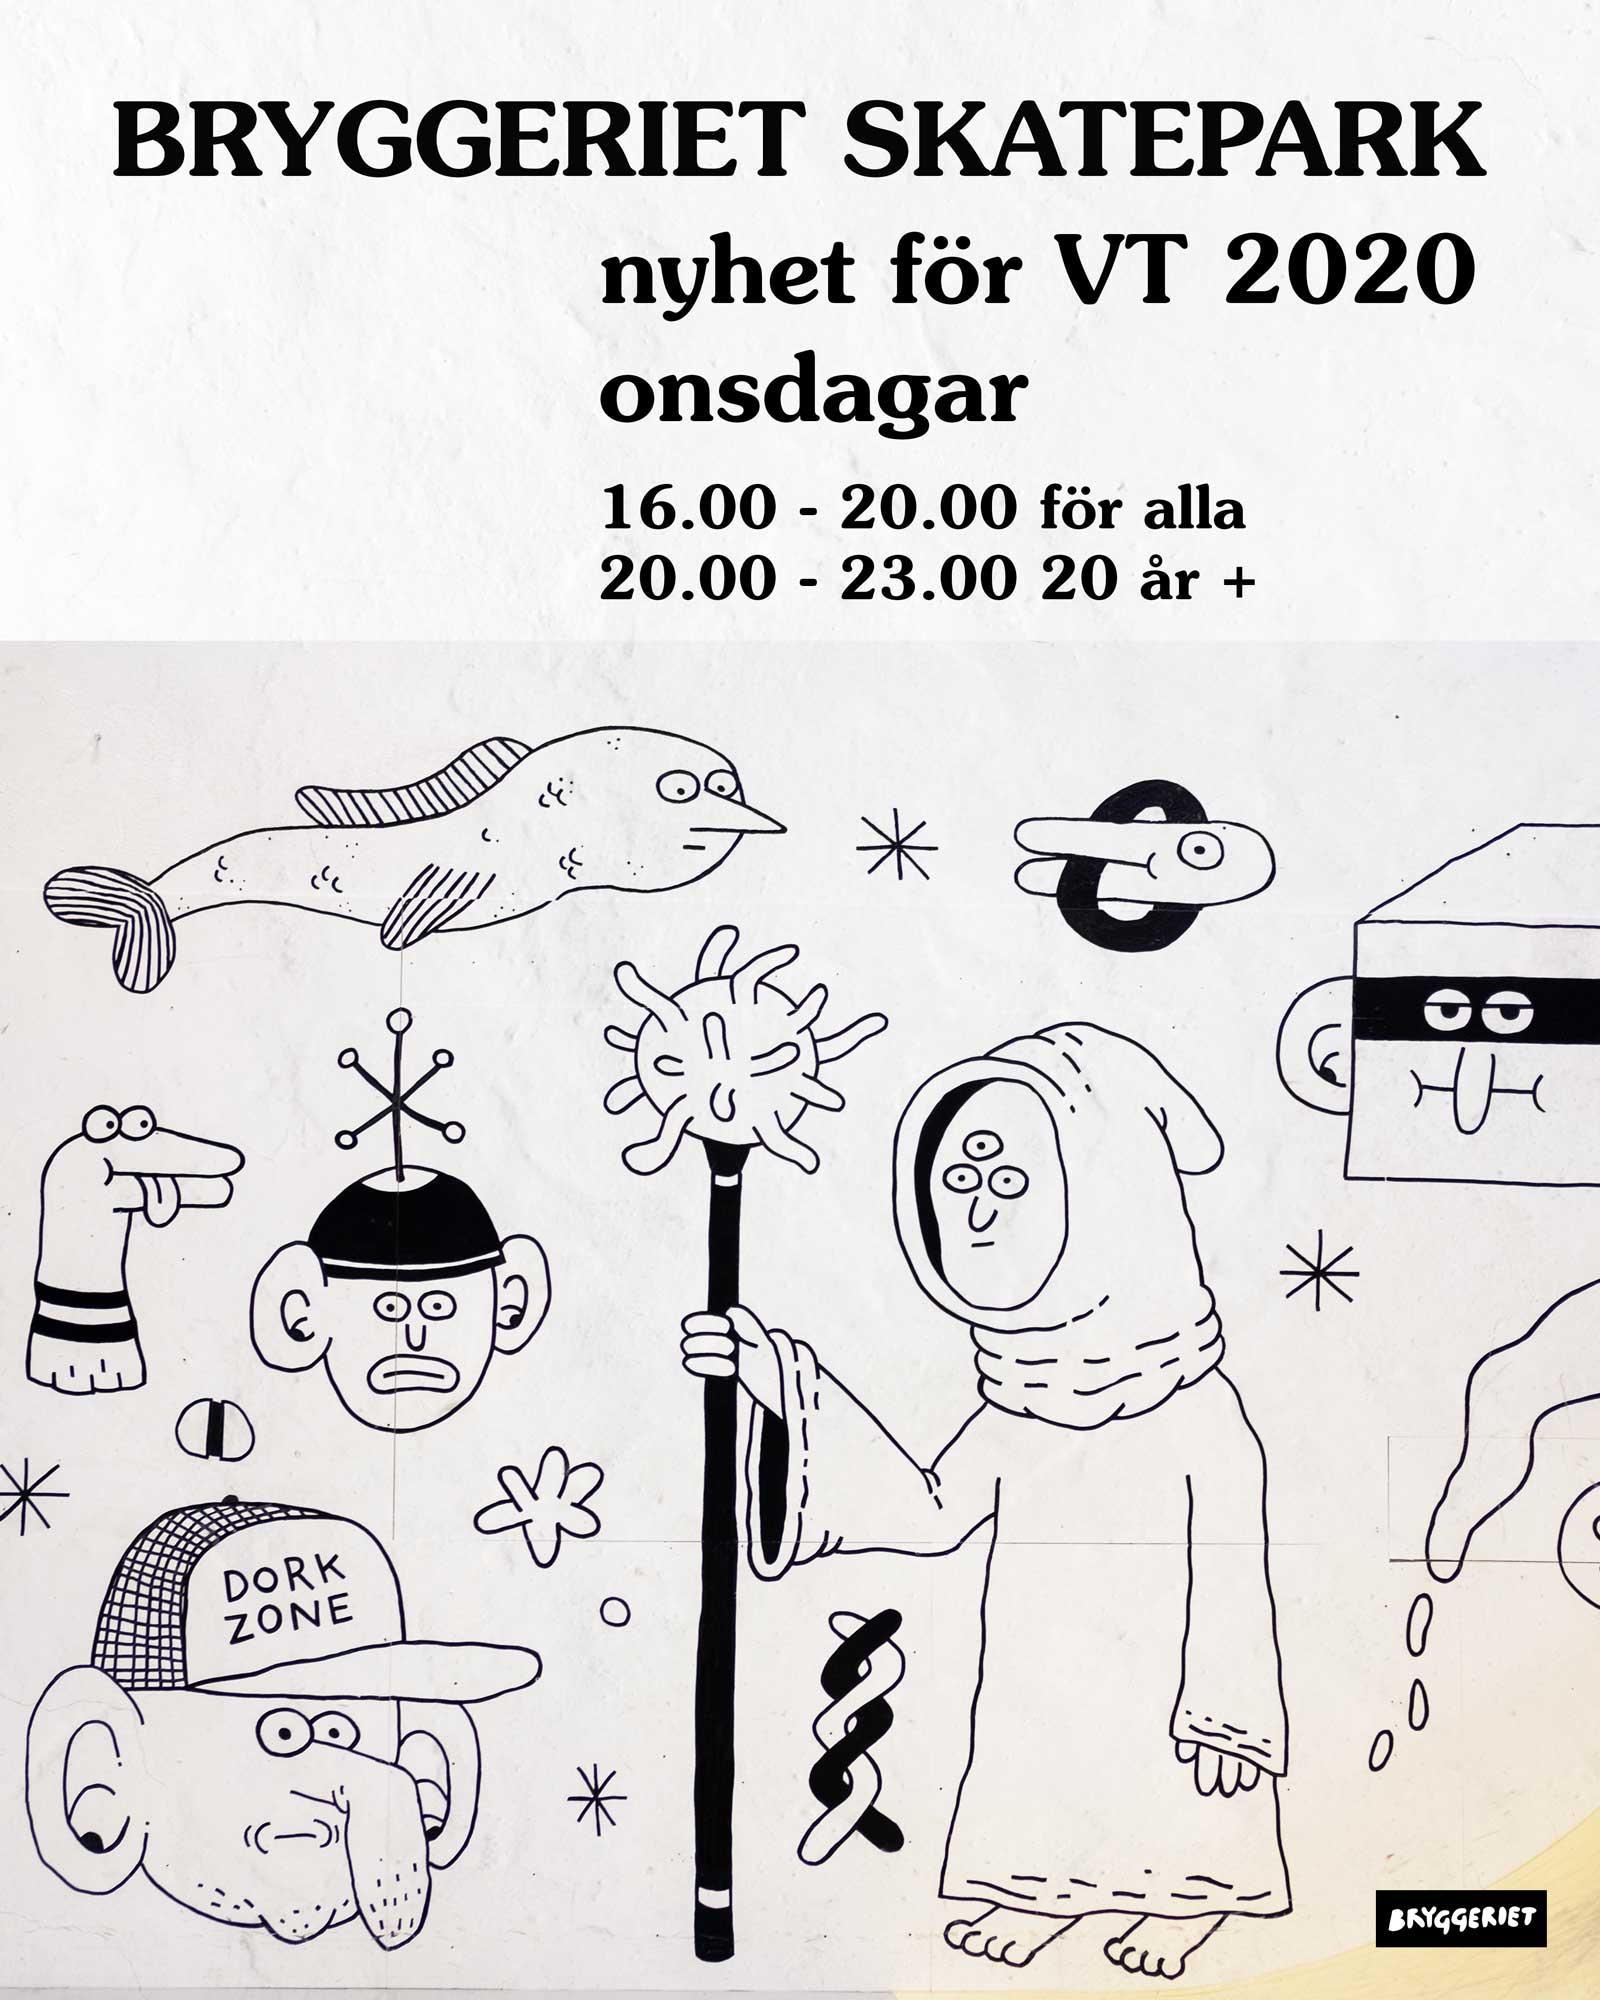 VT2020